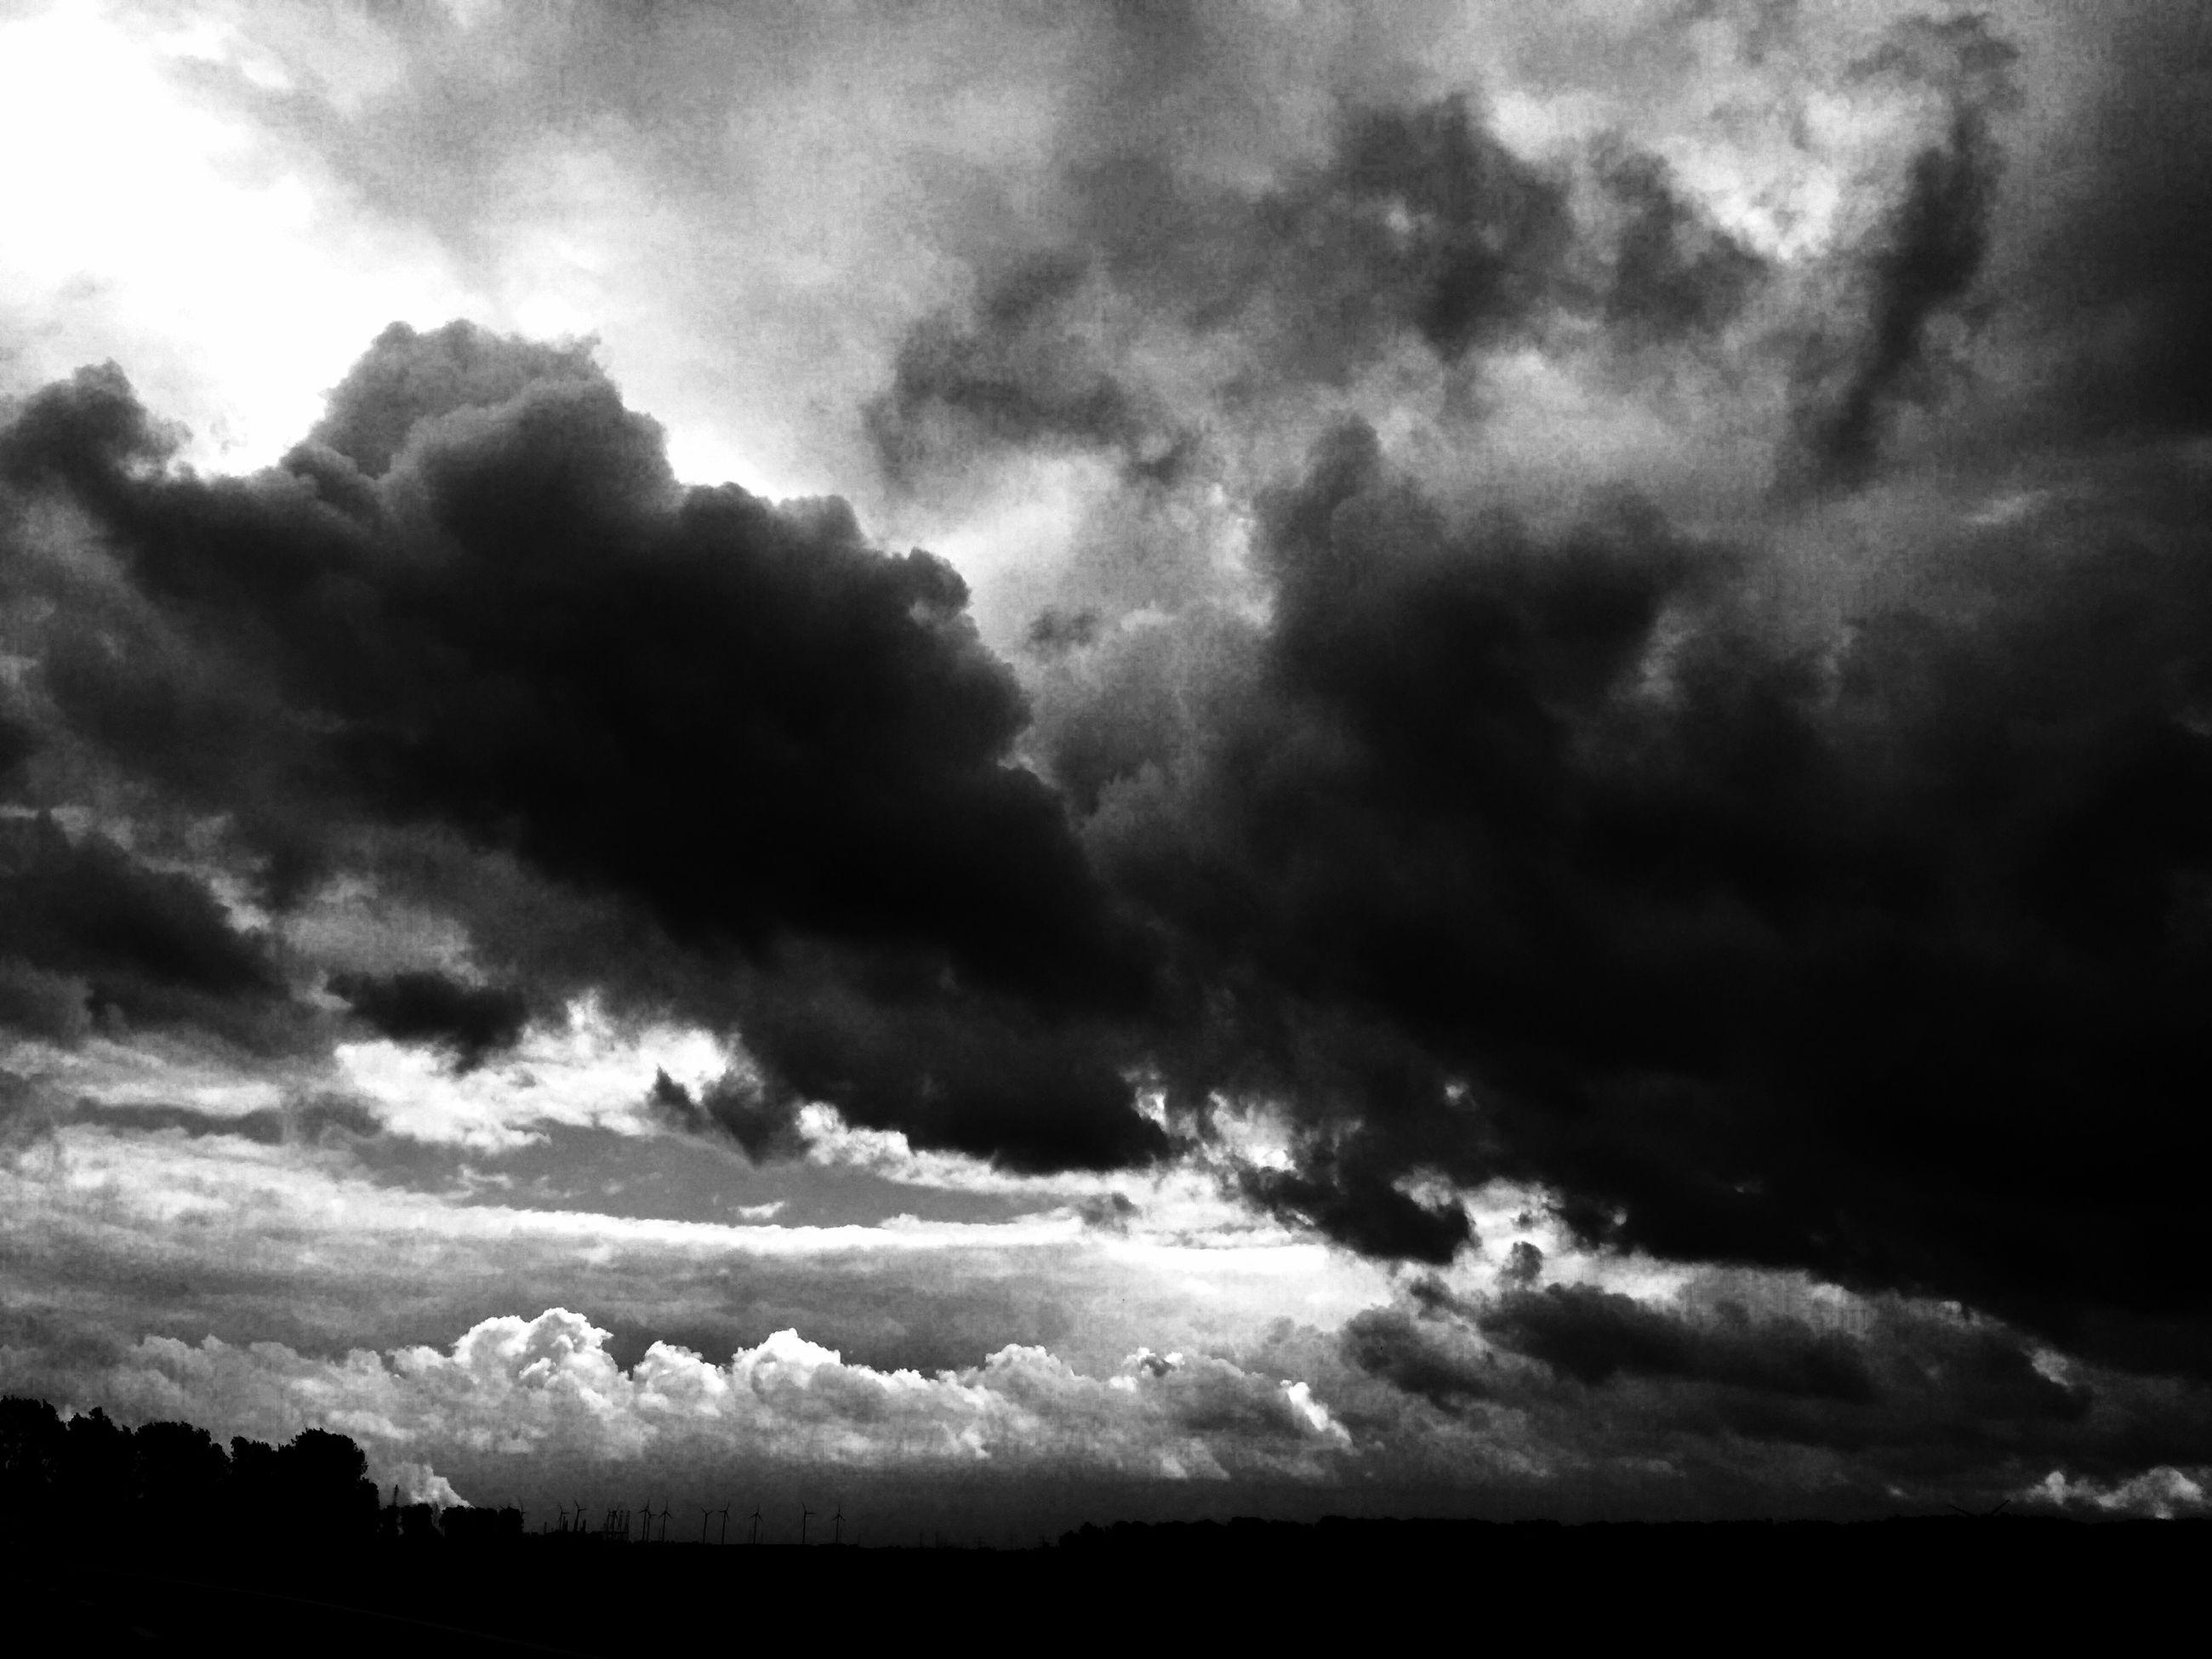 sky, tranquil scene, cloud - sky, tranquility, cloudy, scenics, beauty in nature, landscape, nature, cloud, weather, silhouette, overcast, cloudscape, storm cloud, idyllic, dramatic sky, field, dusk, non-urban scene